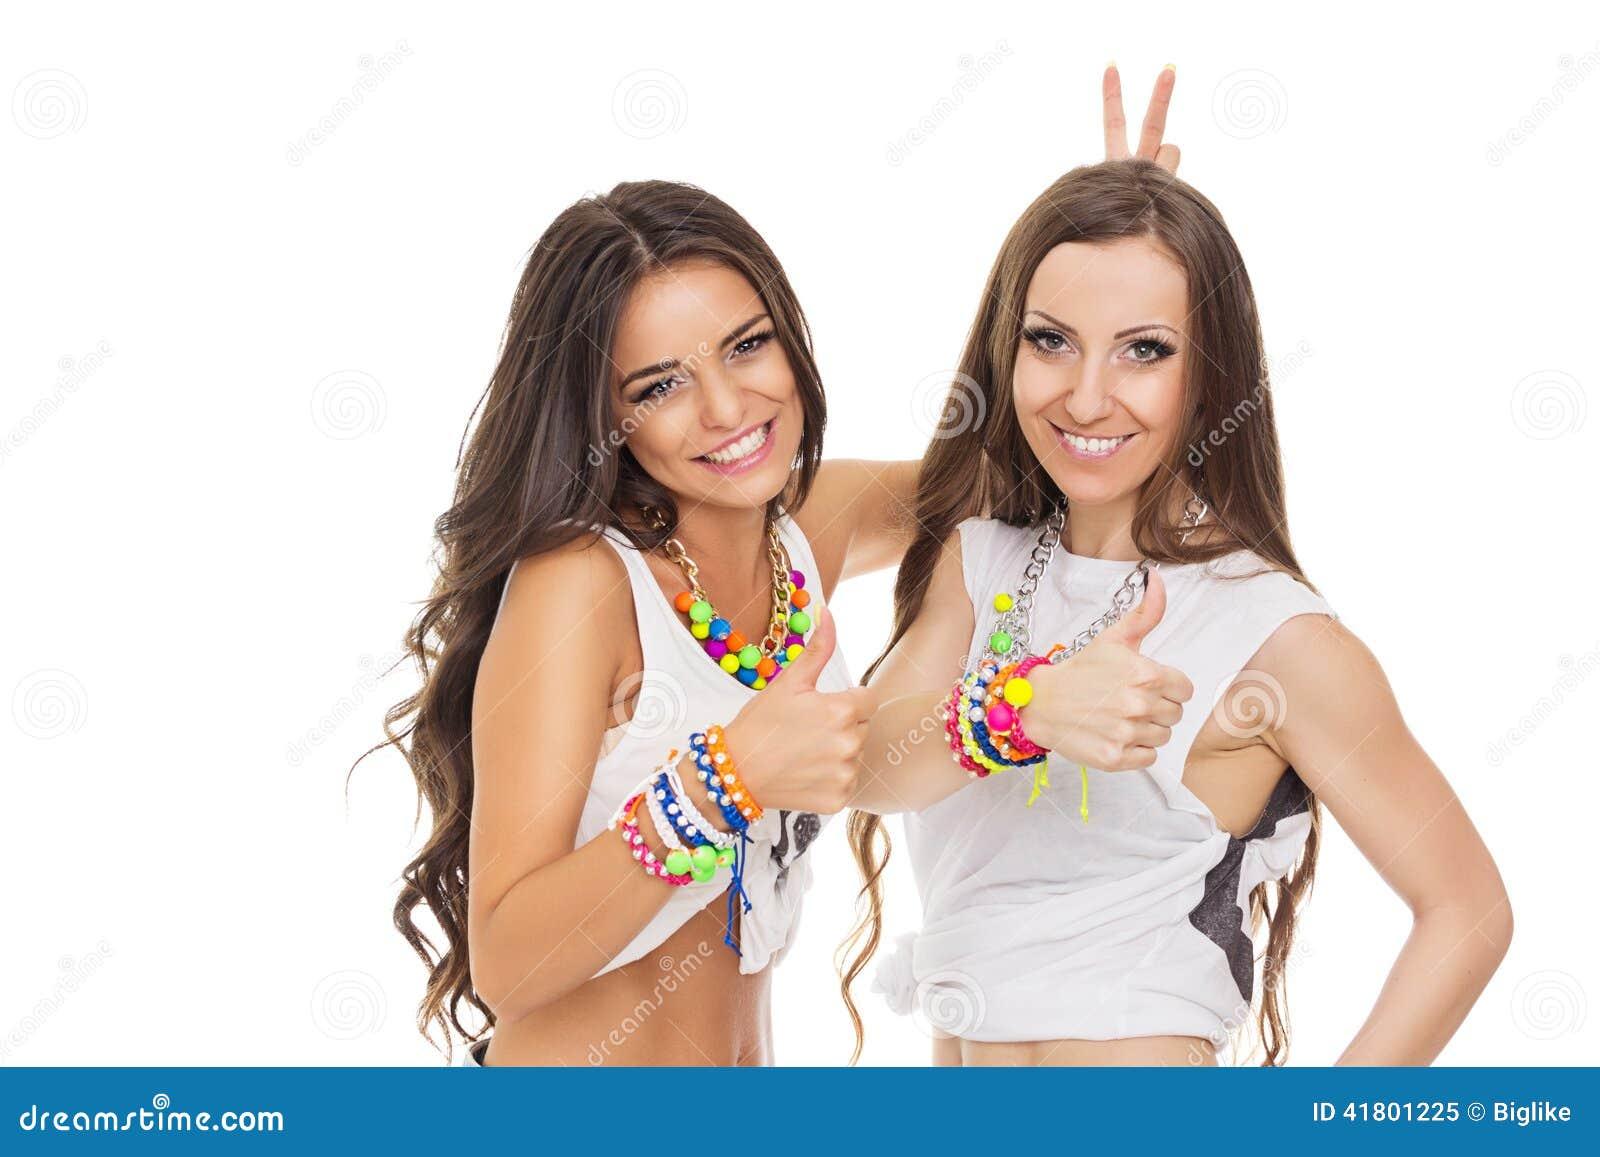 model spanish girl personals Seminary spanish girl personals flirting dating with hot individuals.